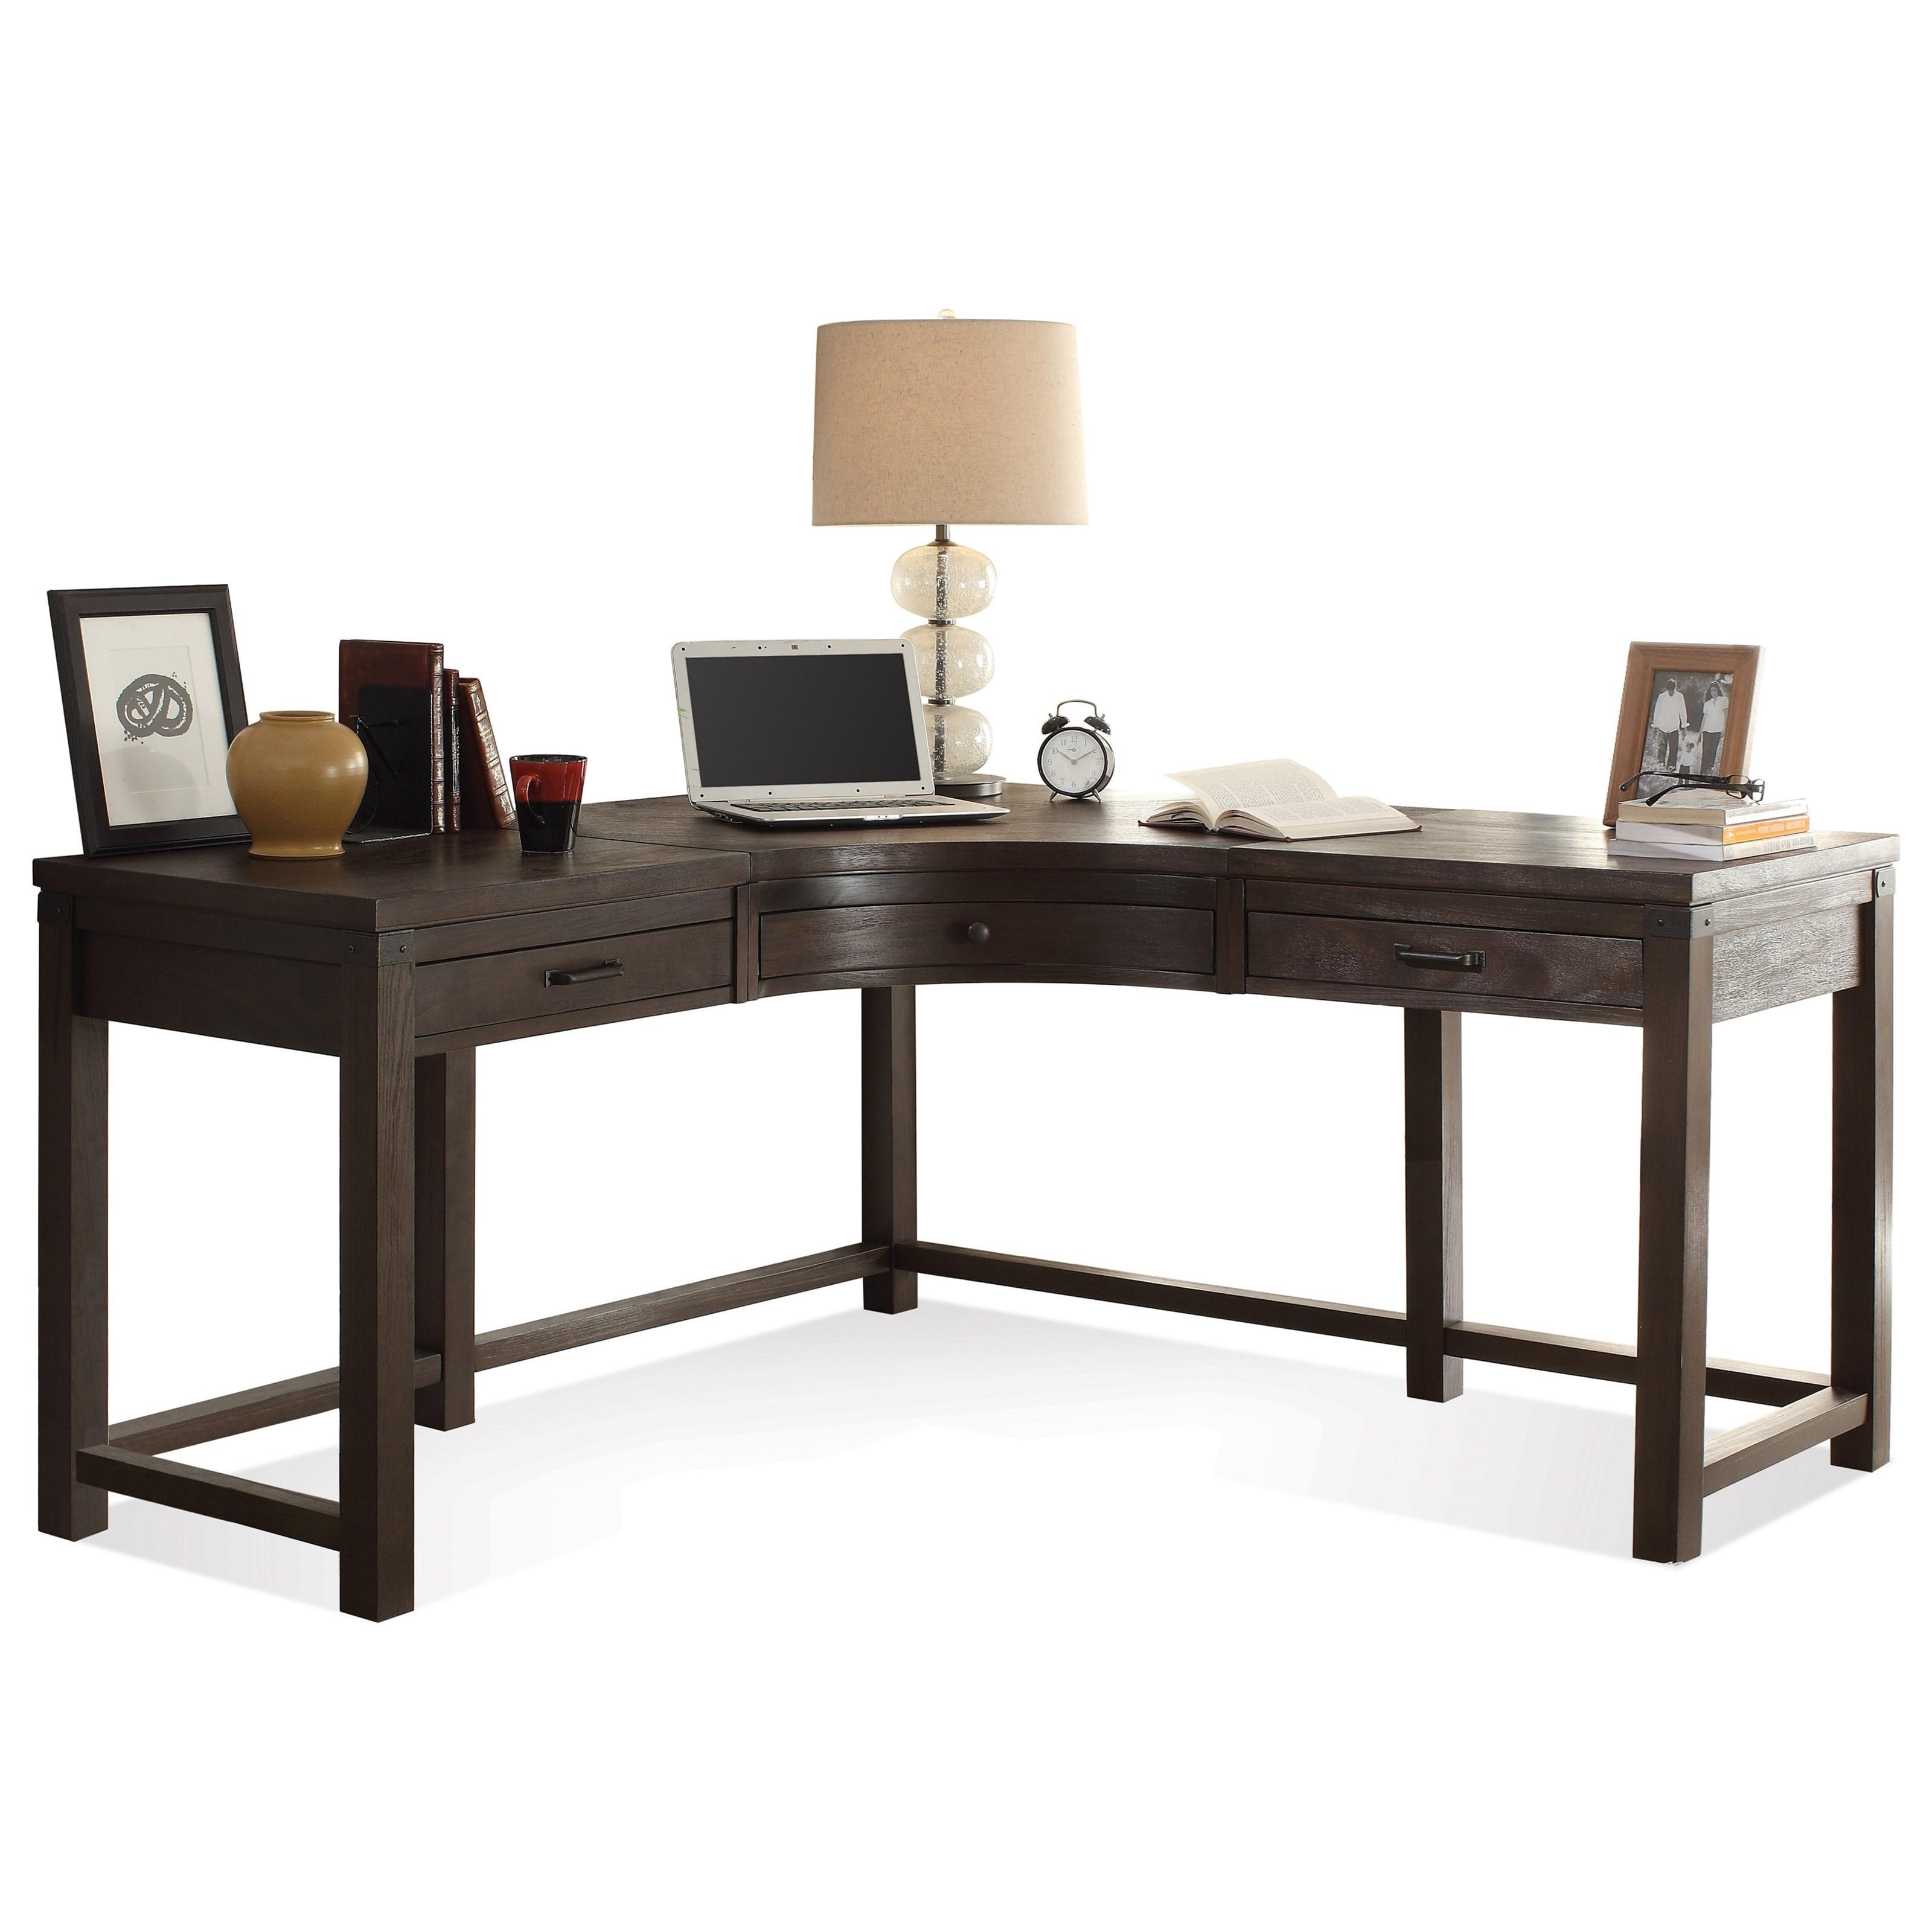 Riverside Furniture Promenade 3 Drawer Curved Corner Desk